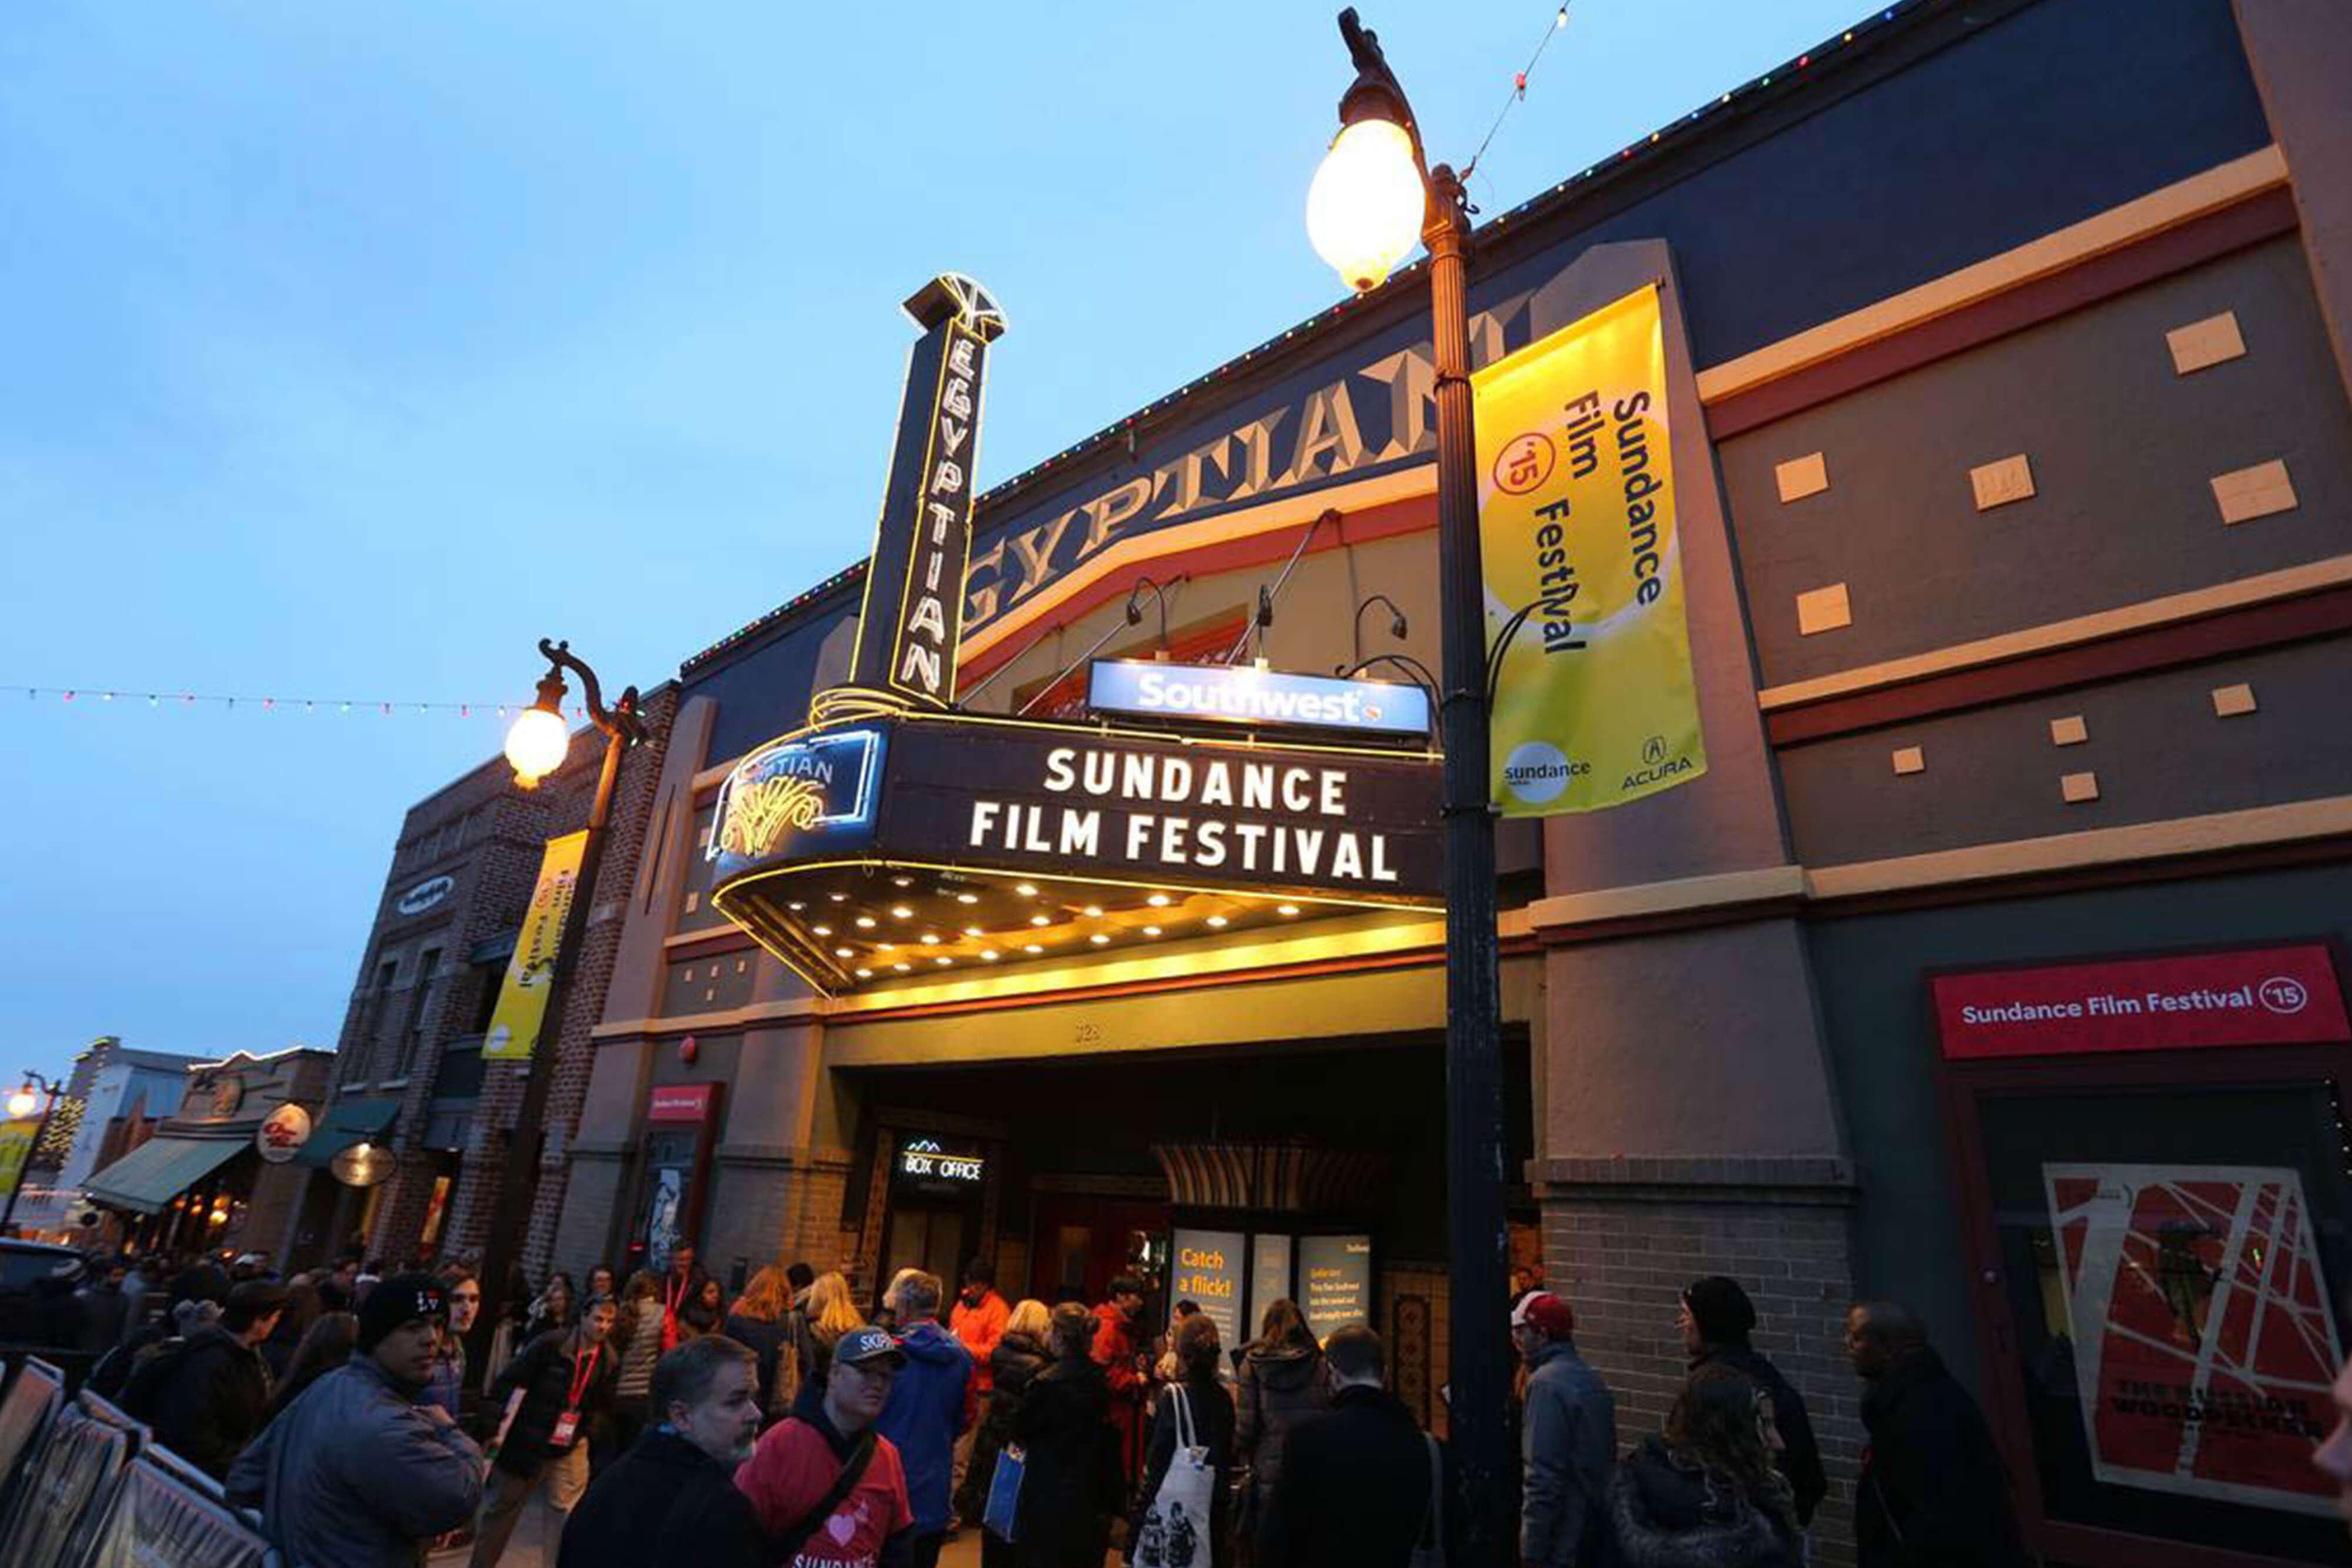 The Best Hotel In Park City For Sundance Film Festival - Sundance Marquee